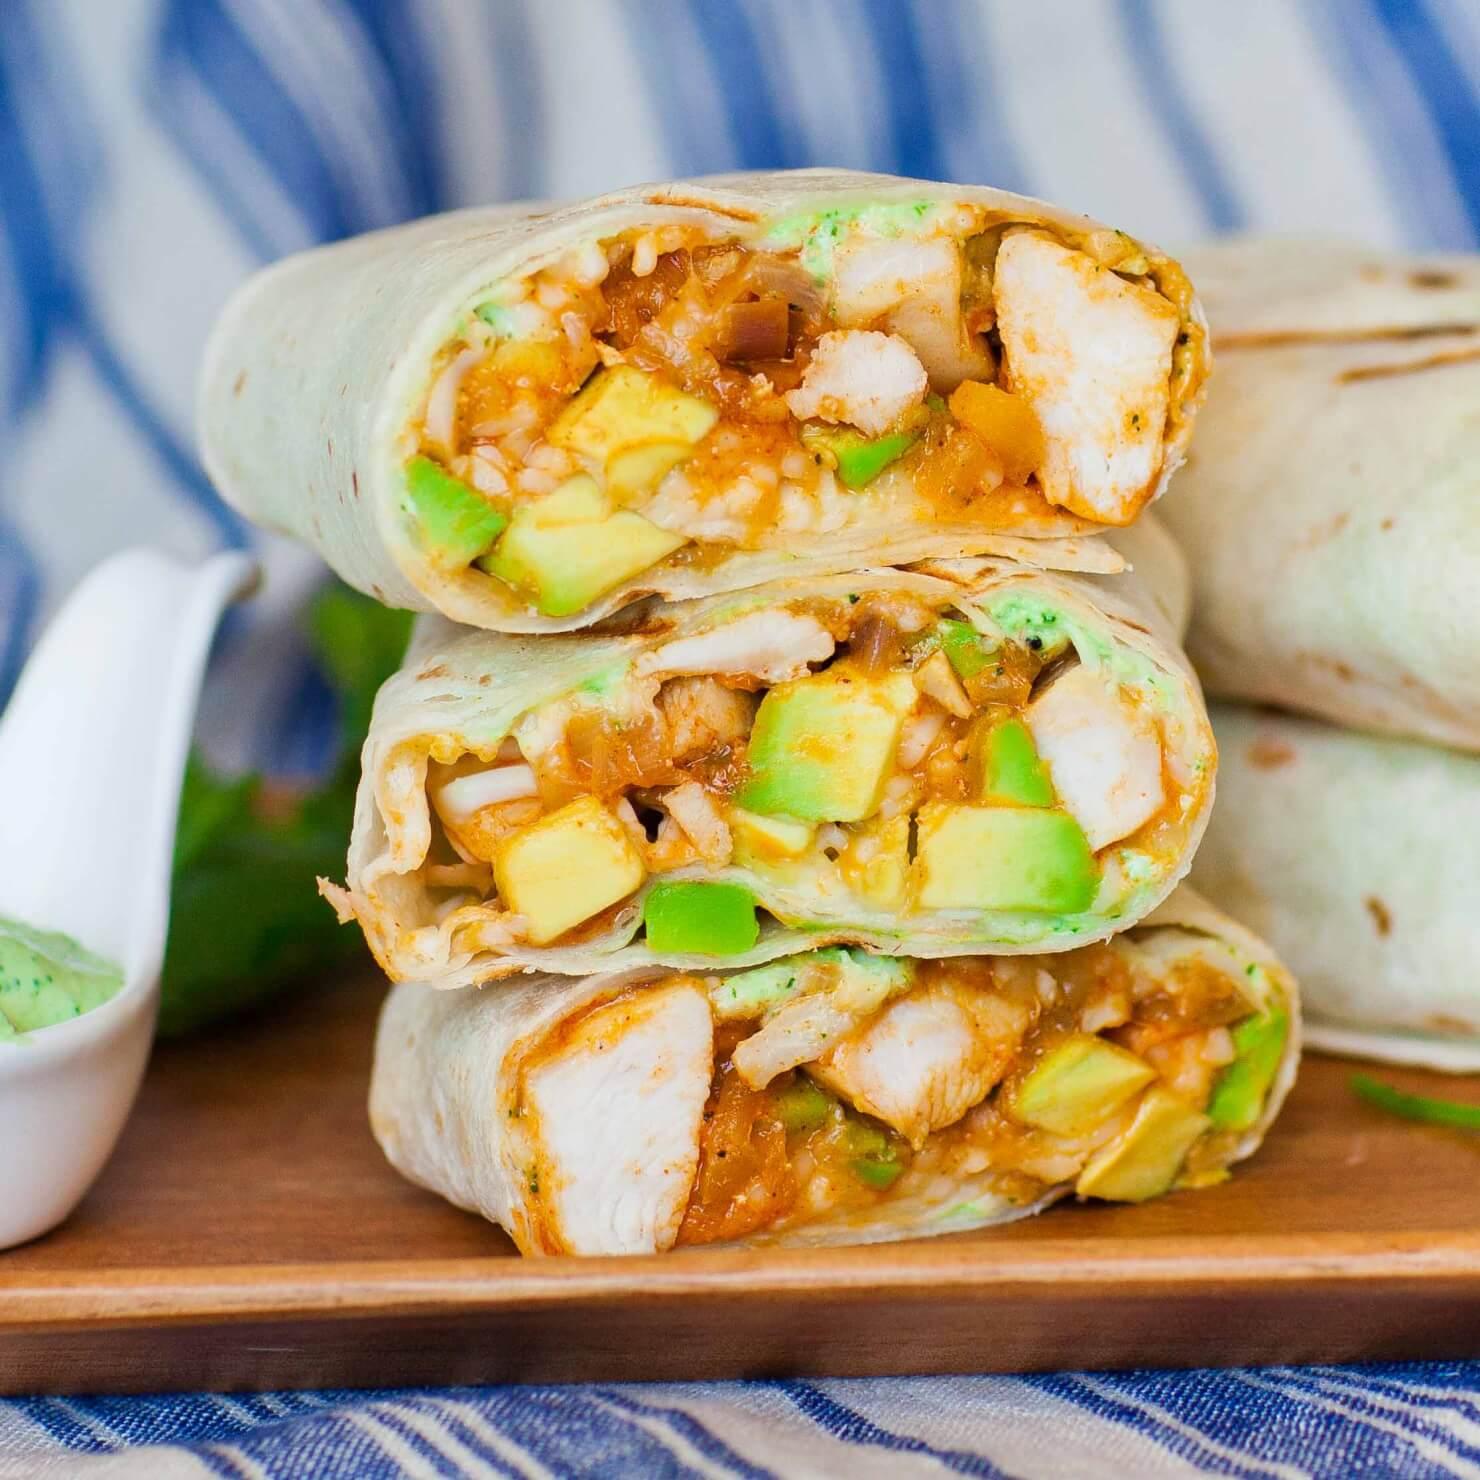 Avocado Chicken Burrito with Cilantro Sauce - Tatyanas ...